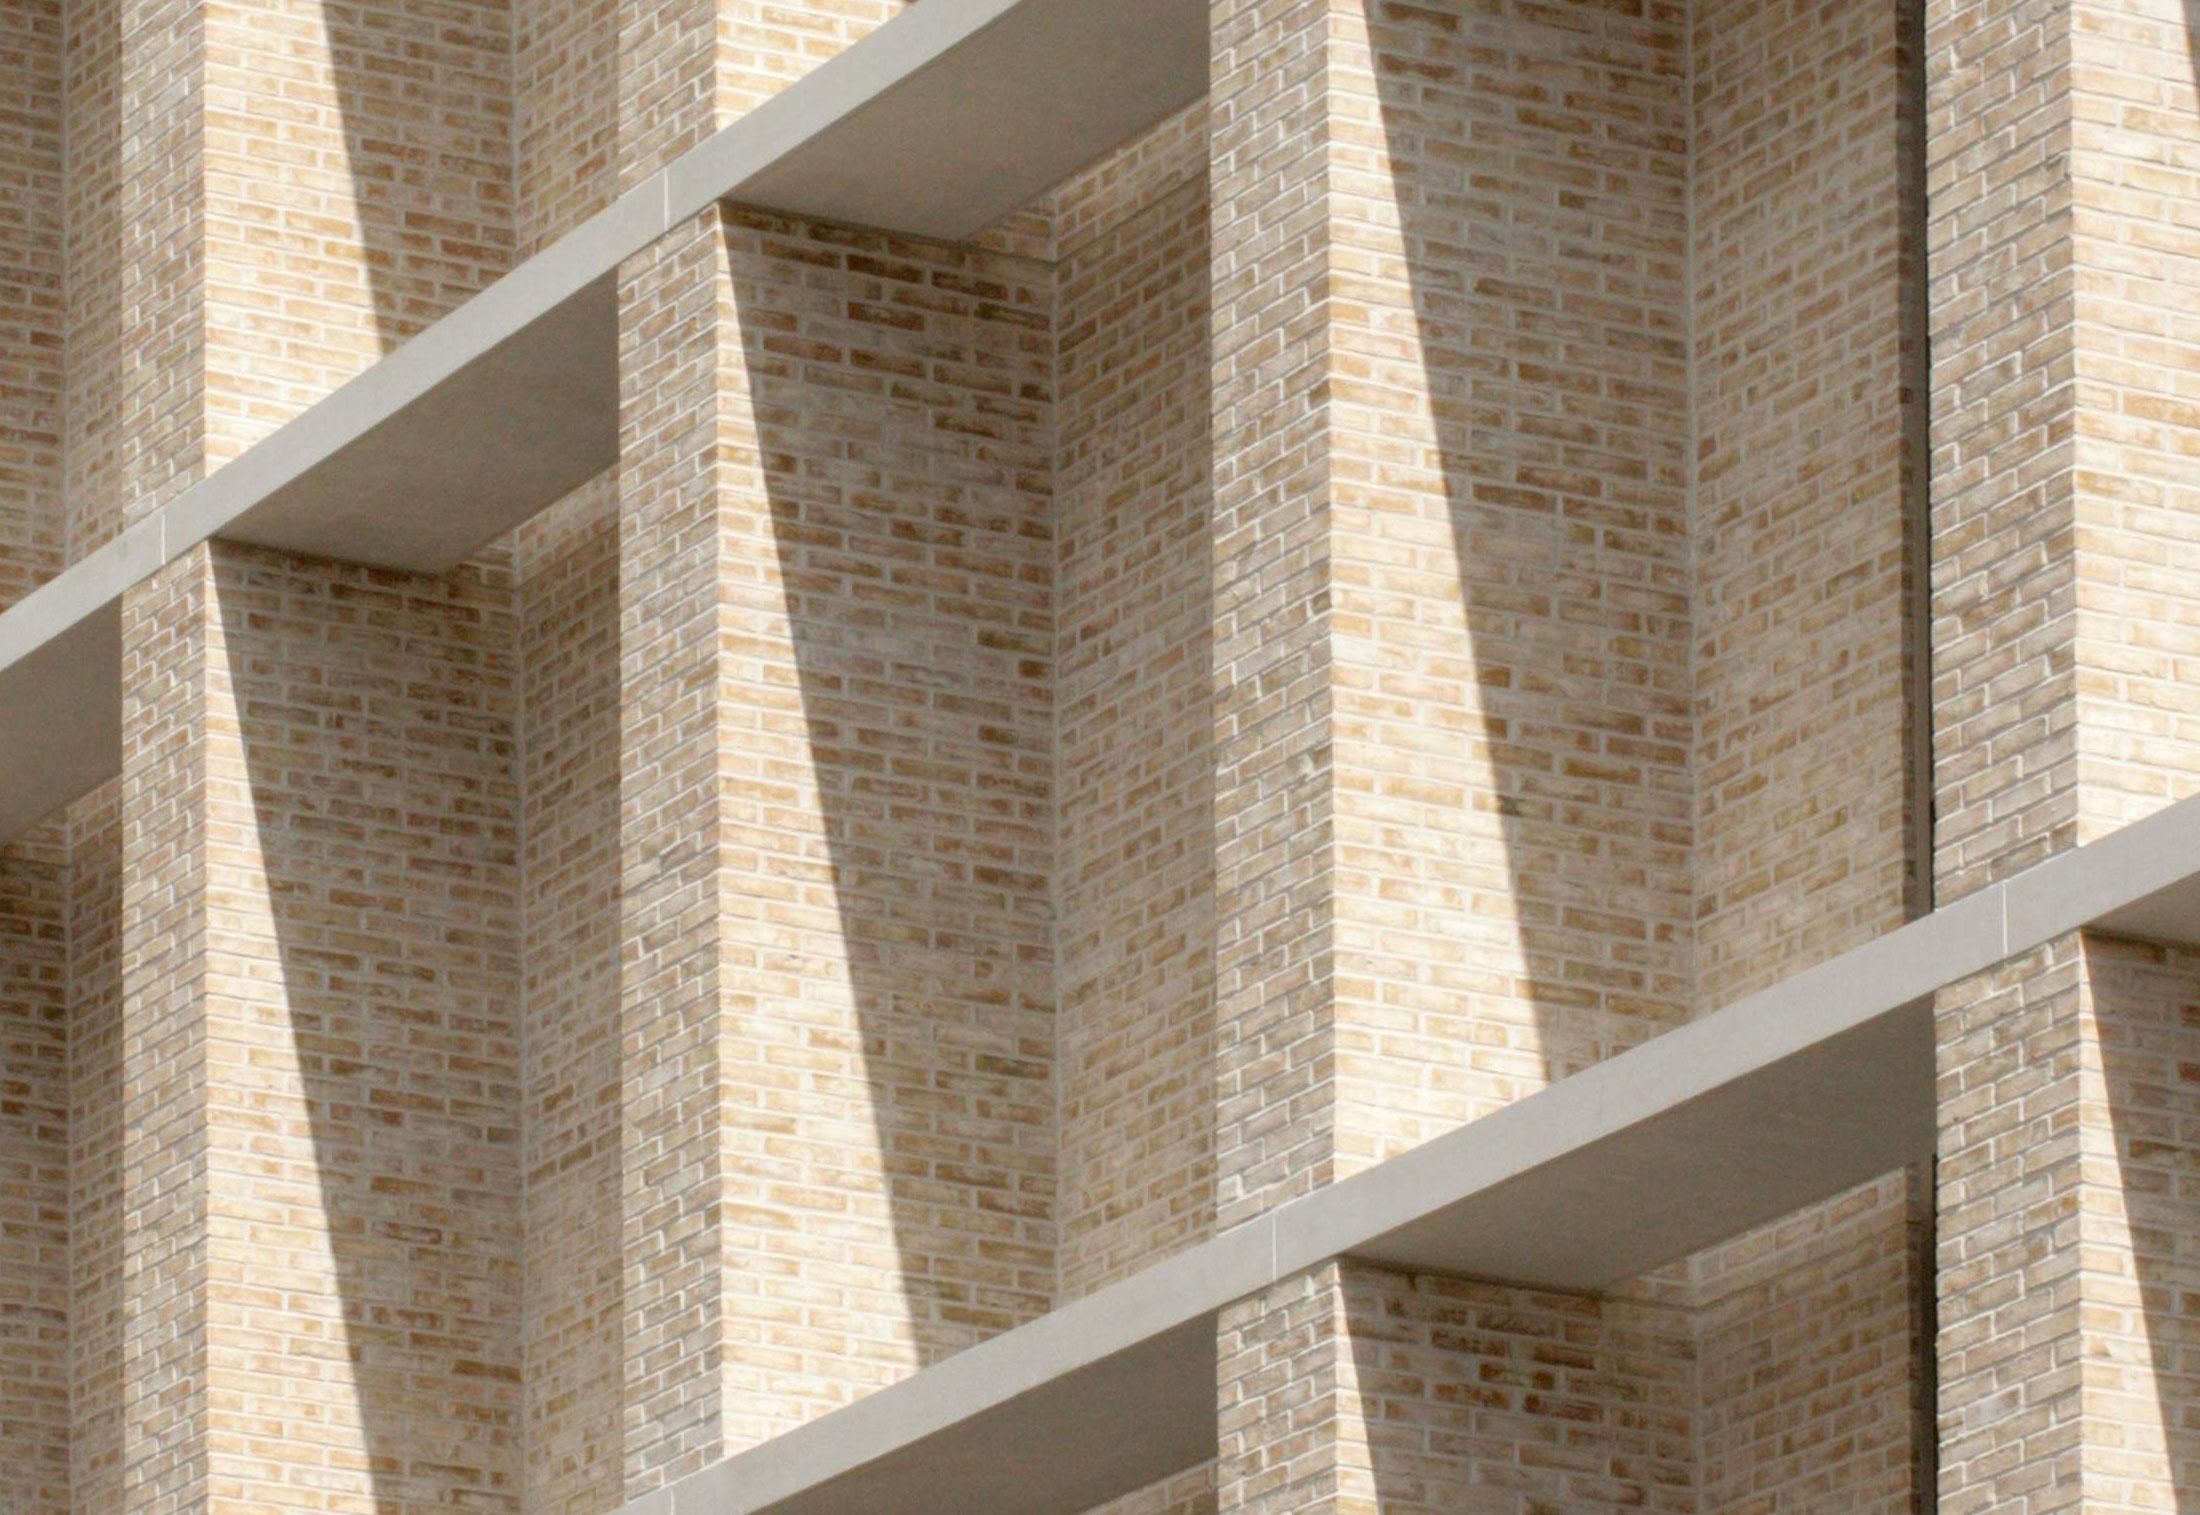 D71 By Petersen Tegl Stylepark